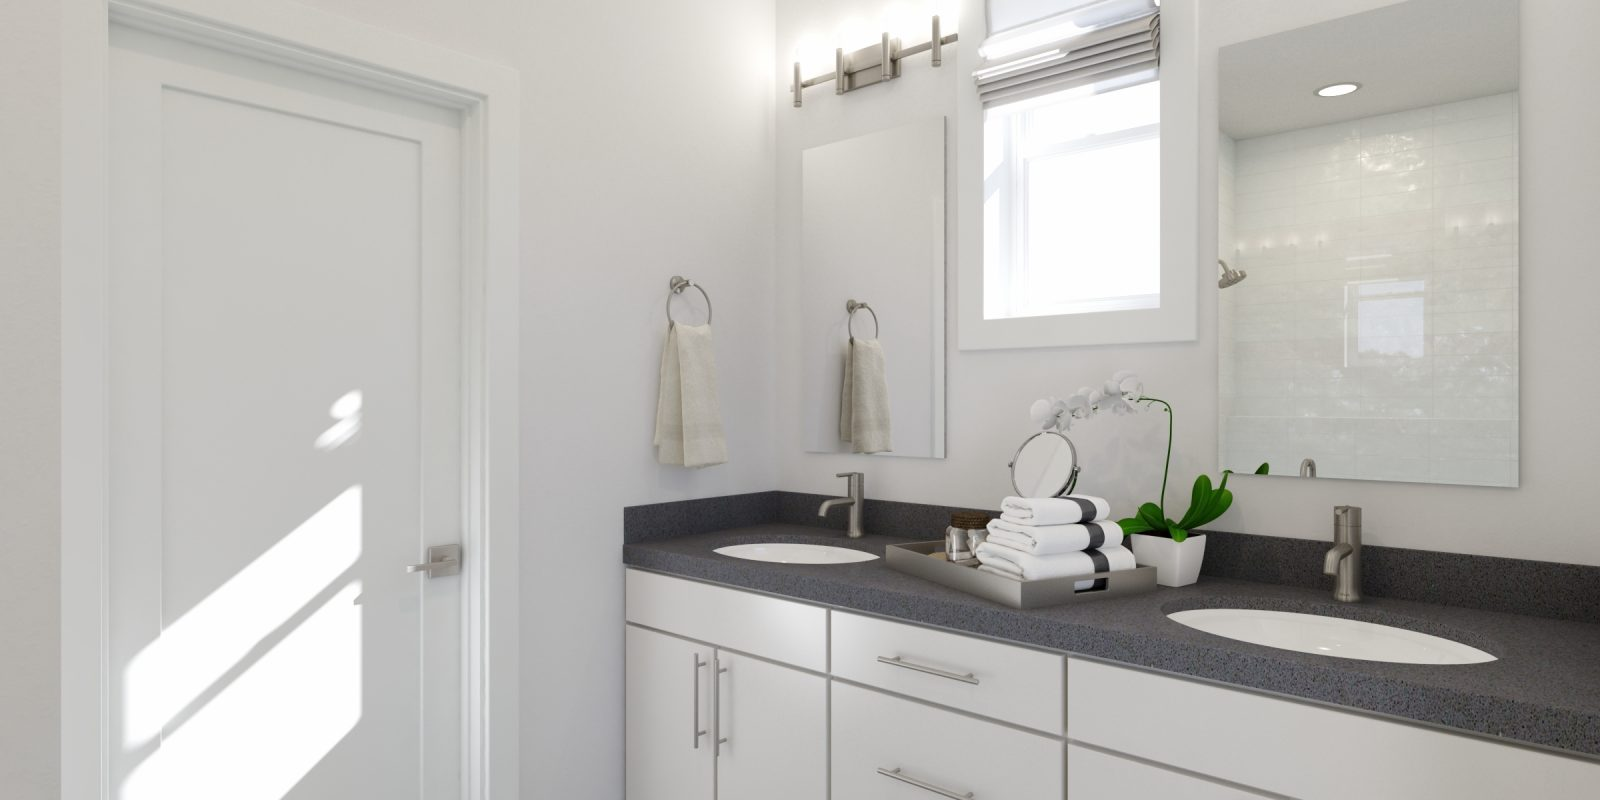 WestRidge DoMore Rows: Oasis - Primary Bathroom